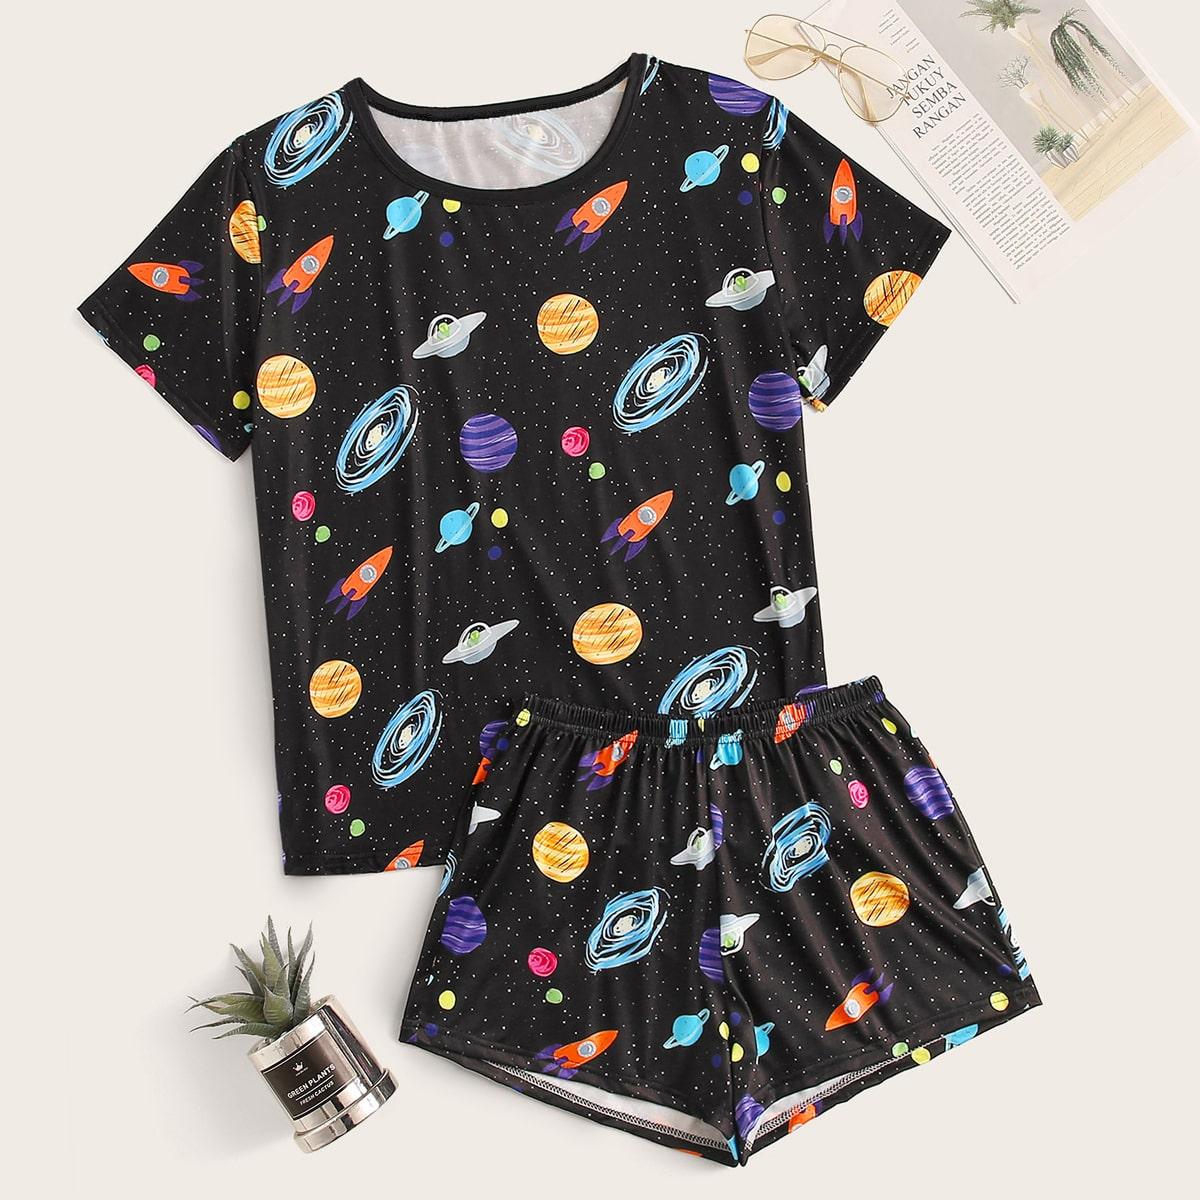 Пижама с графическим принтом от SHEIN